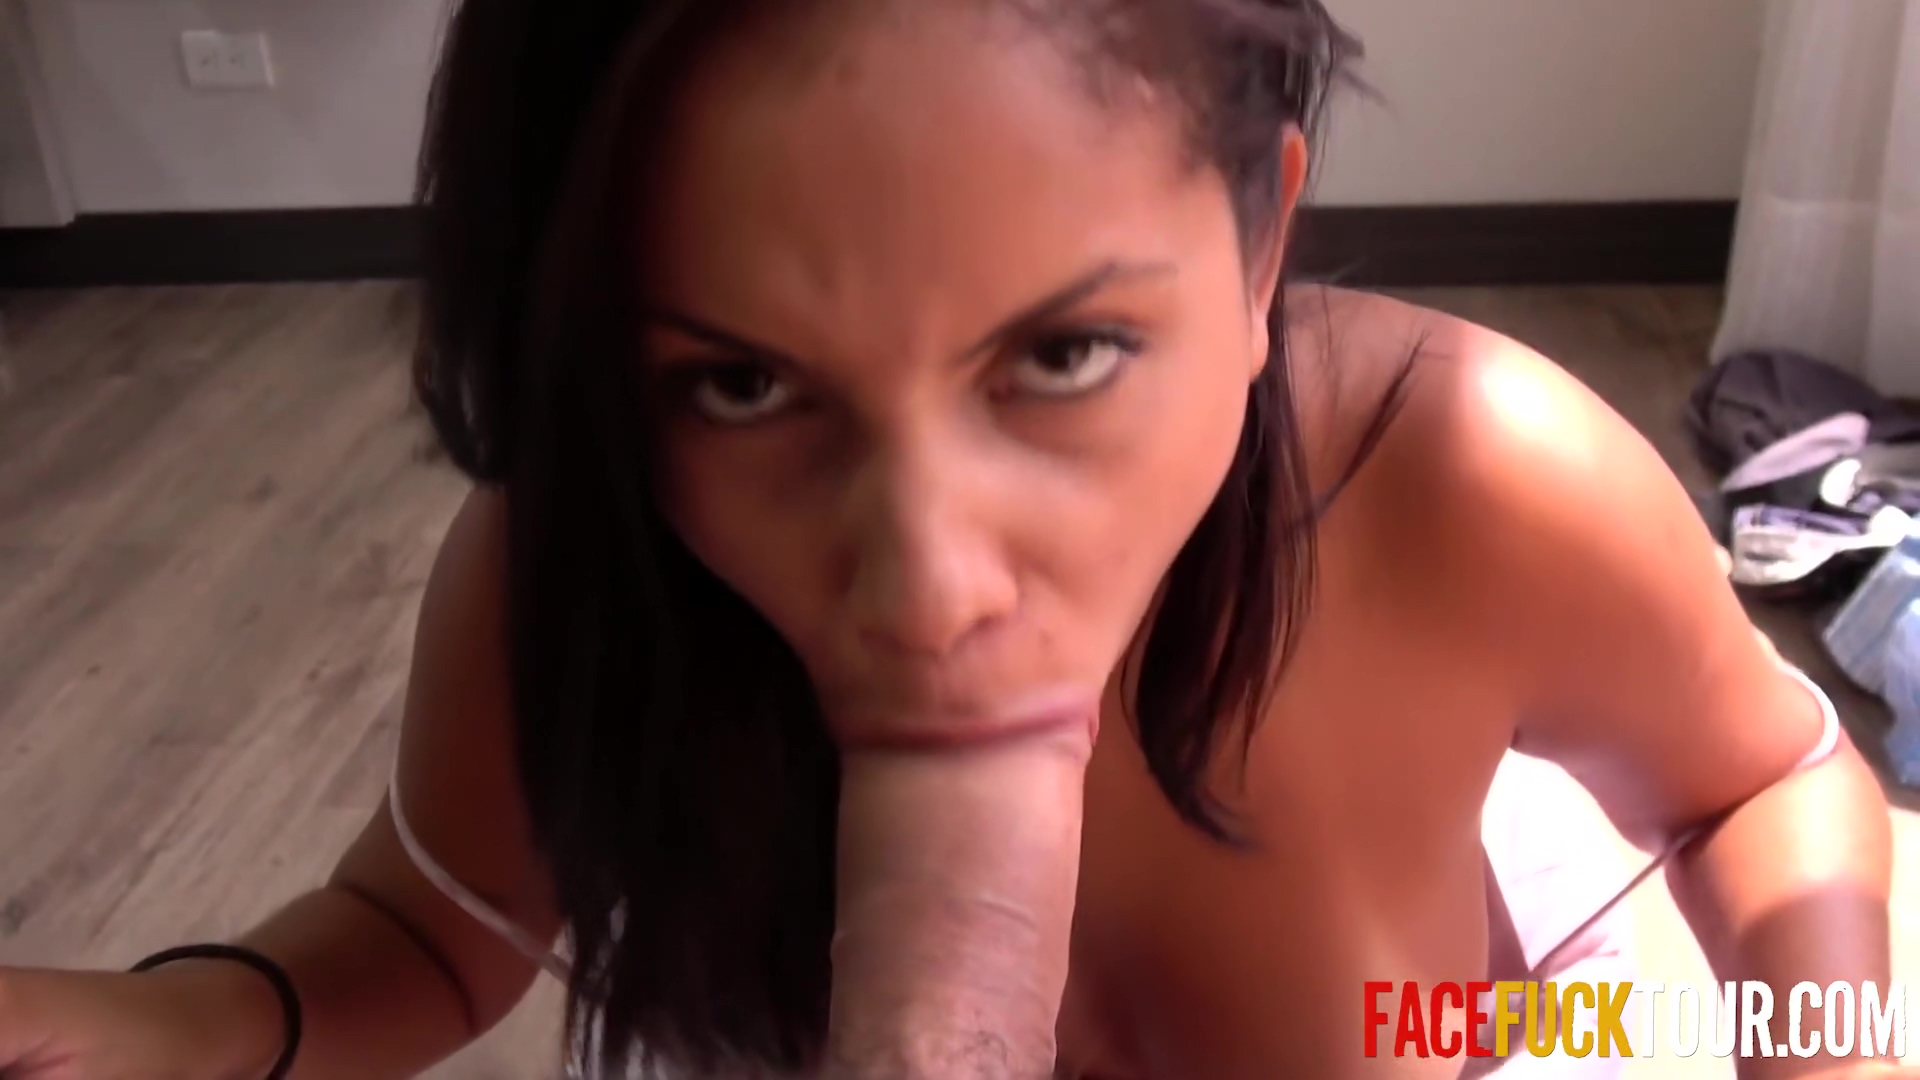 Steven Hard - Latina Dick Sucker Swallows Older Dick